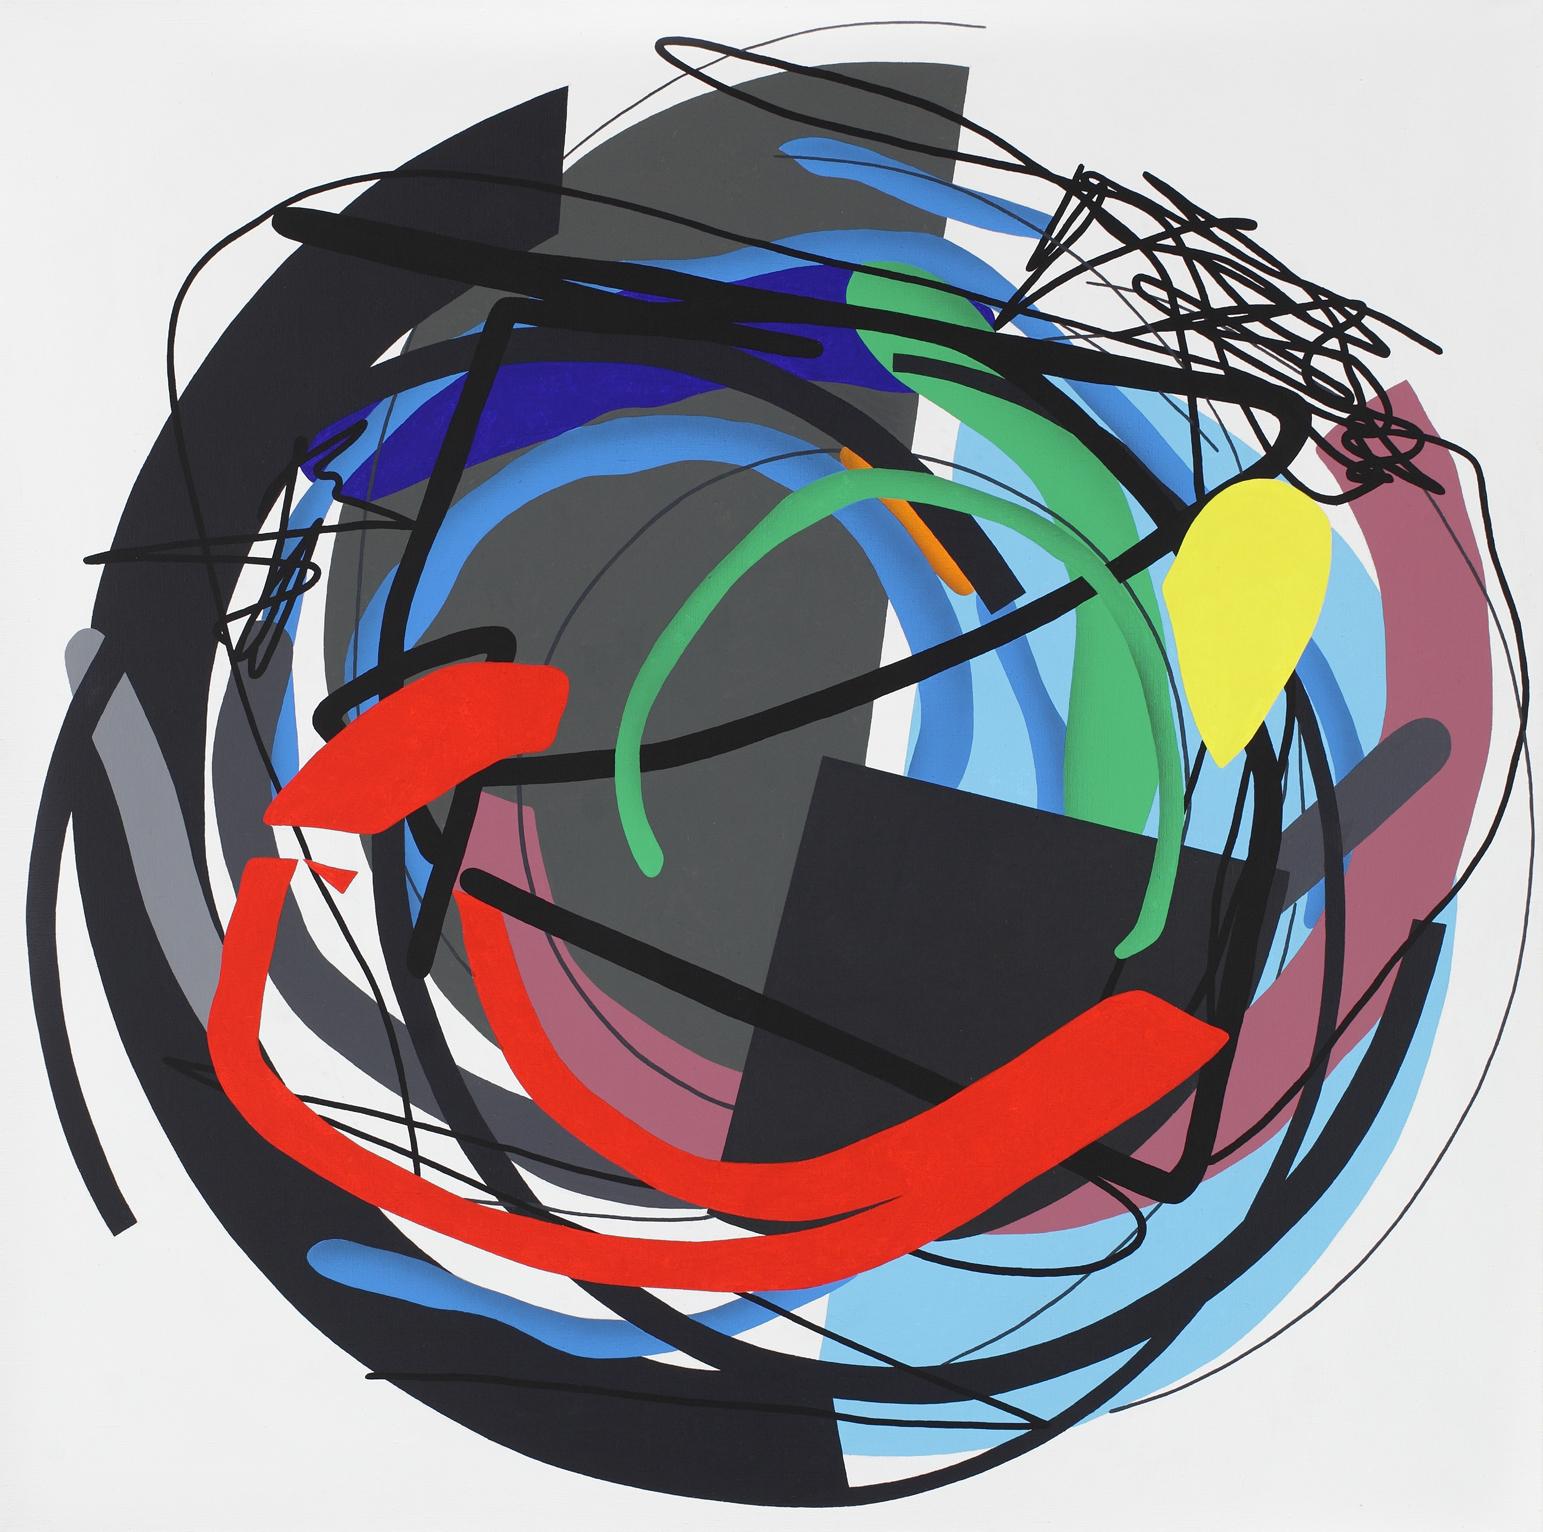 Mandala No. 12 /Split in half/ 2011, acrylic on canvas, 200 x 200 cm